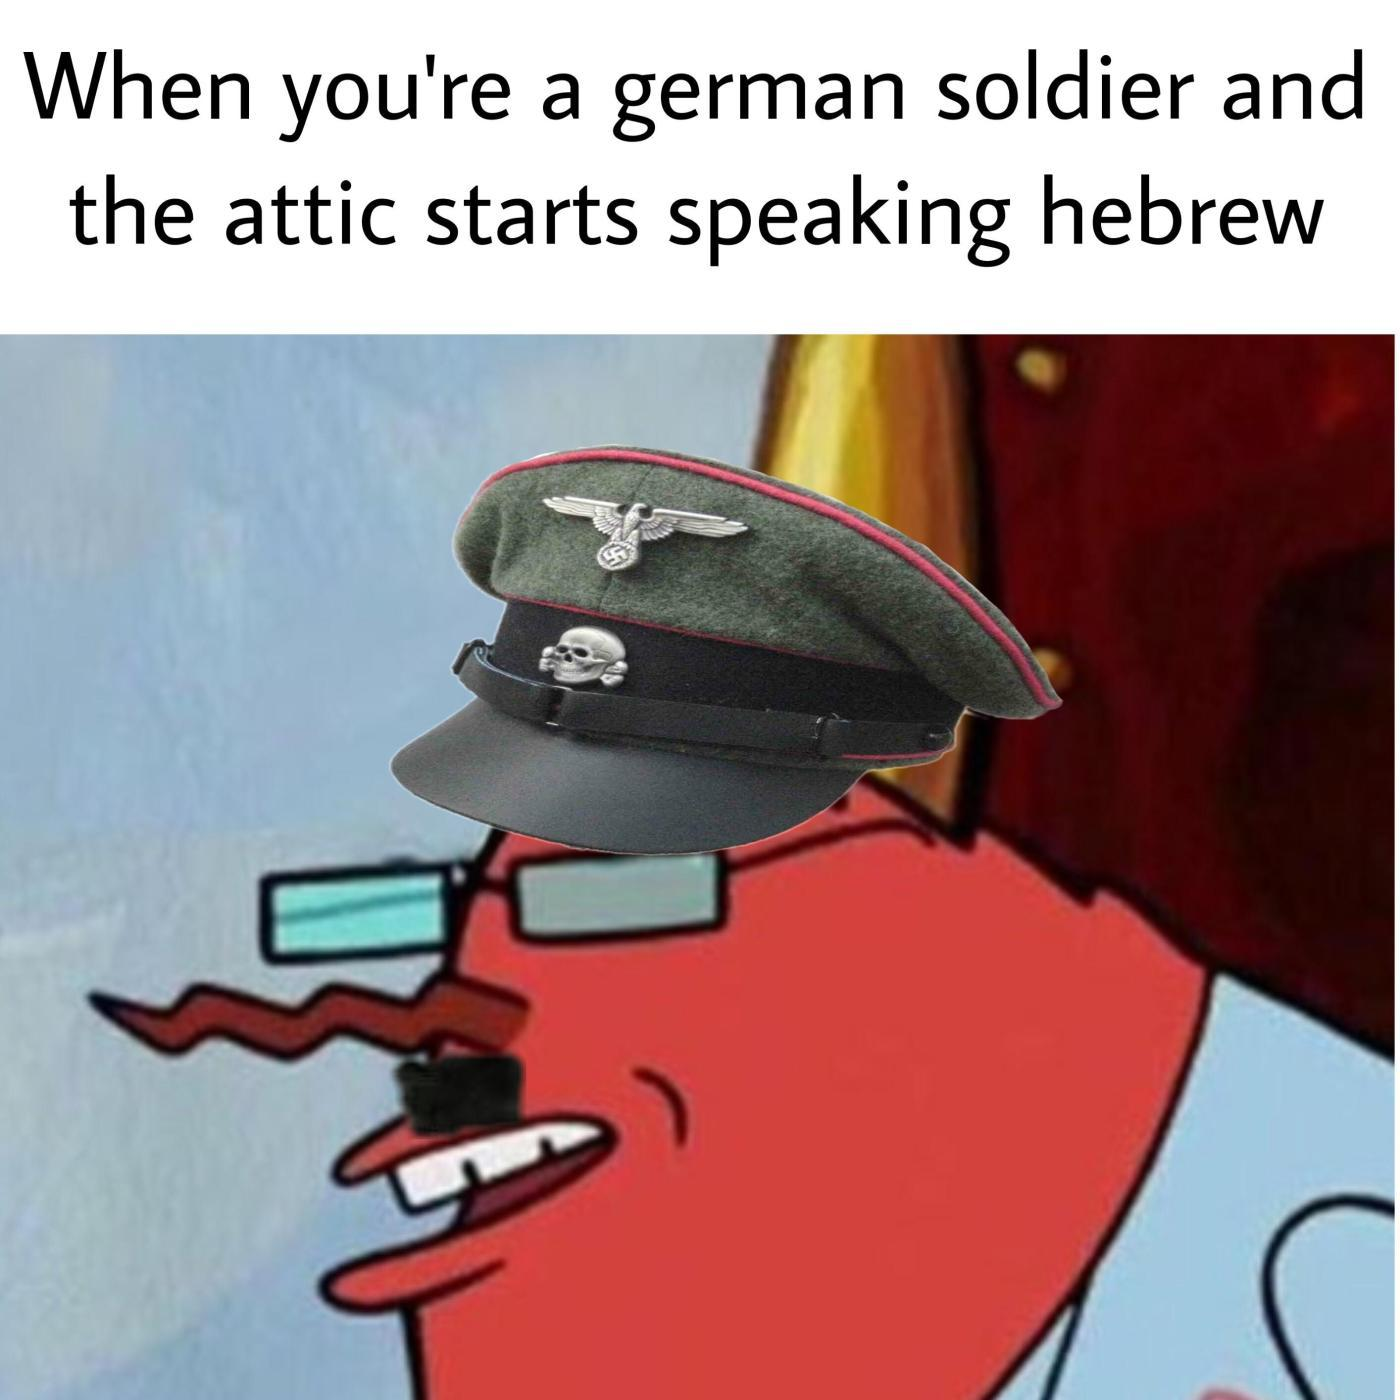 Nazi meme